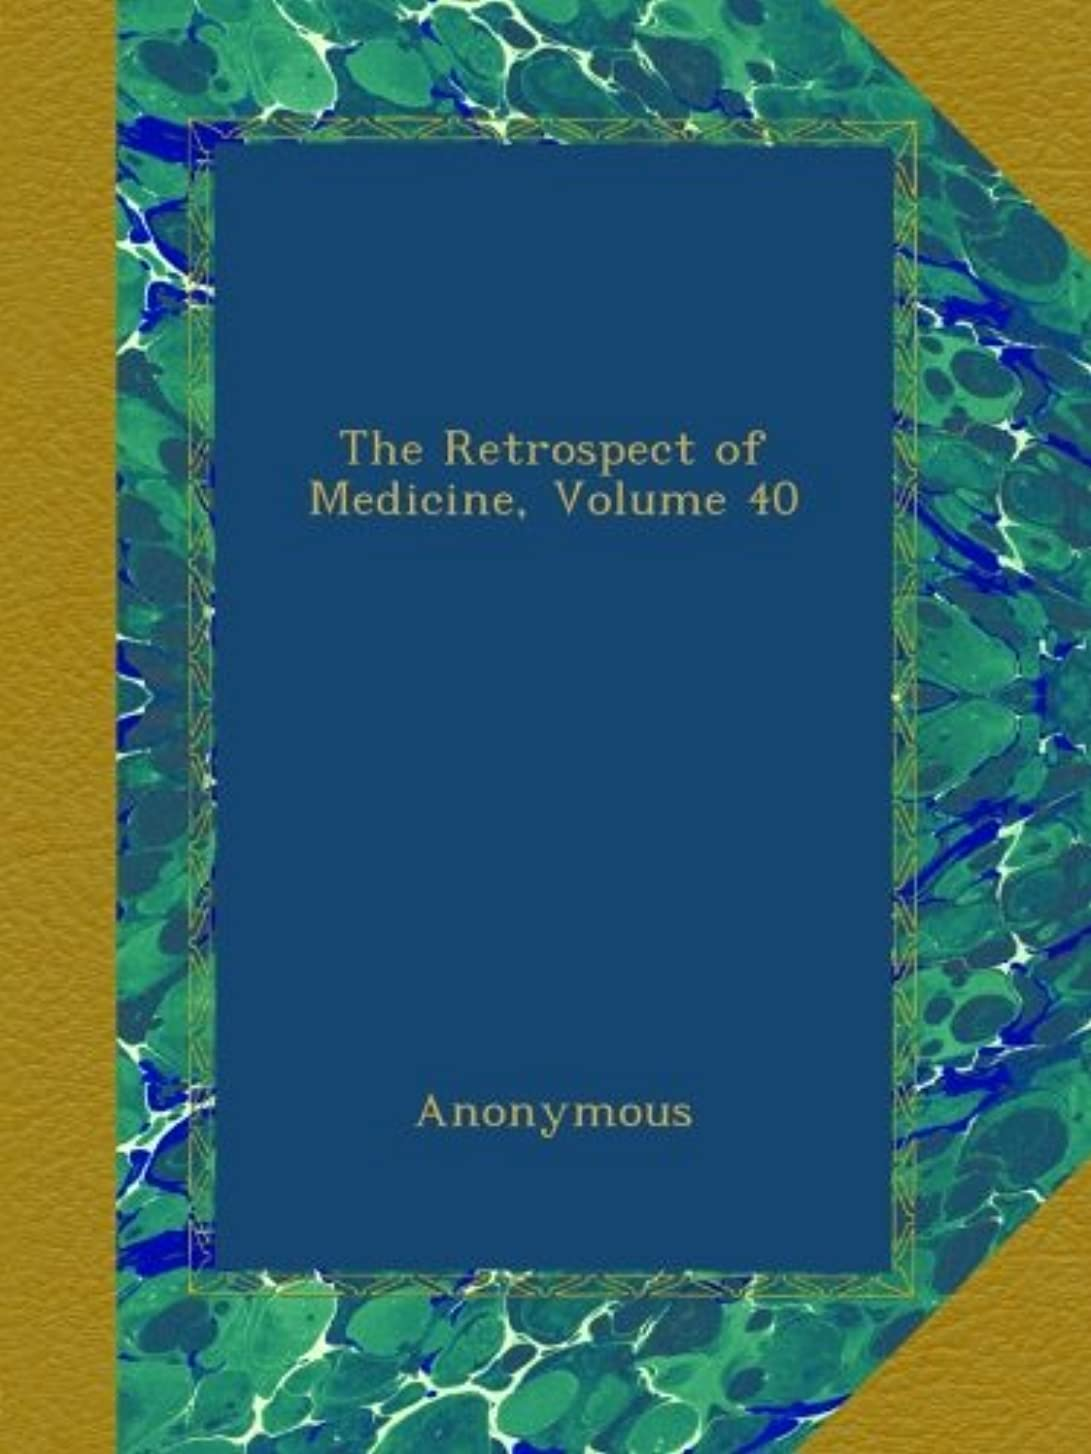 The Retrospect of Medicine, Volume 40